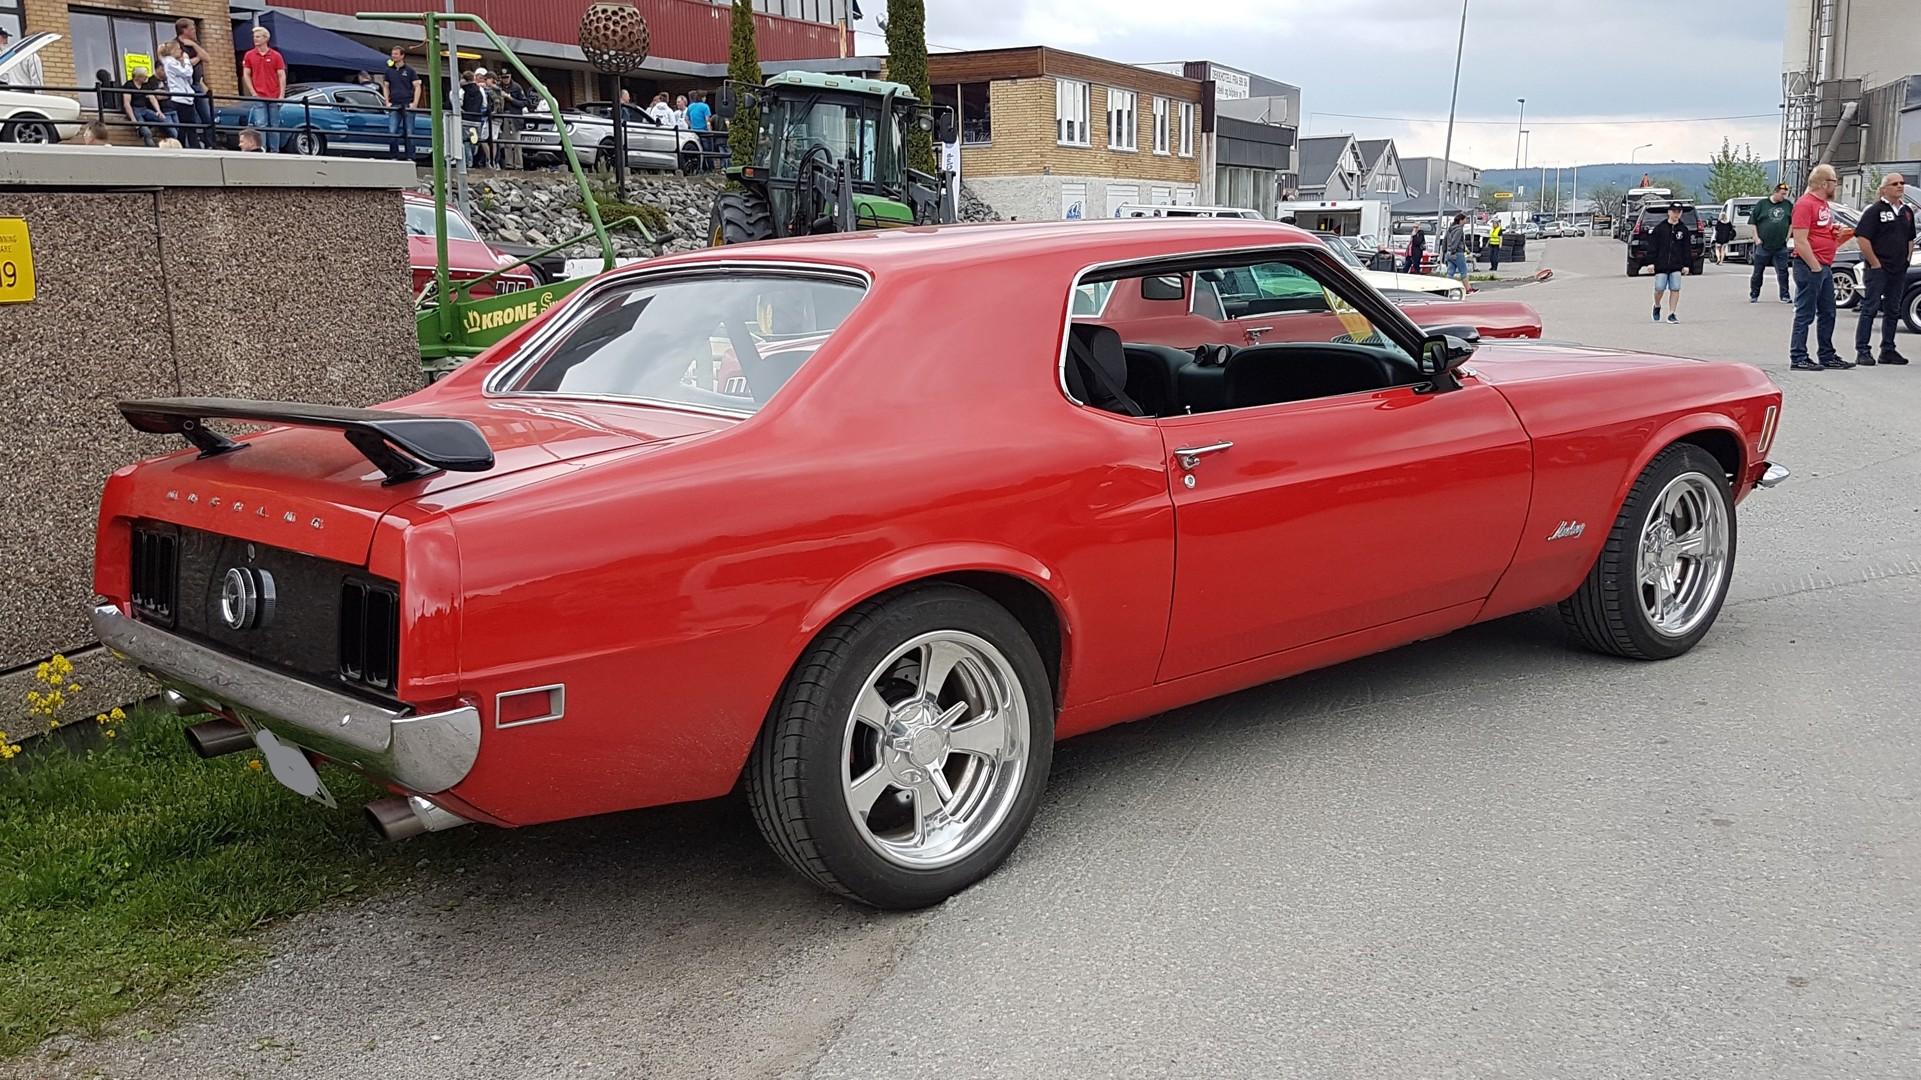 269-1970 Ford Mustang Hardtop 02. Eier- medlem 269